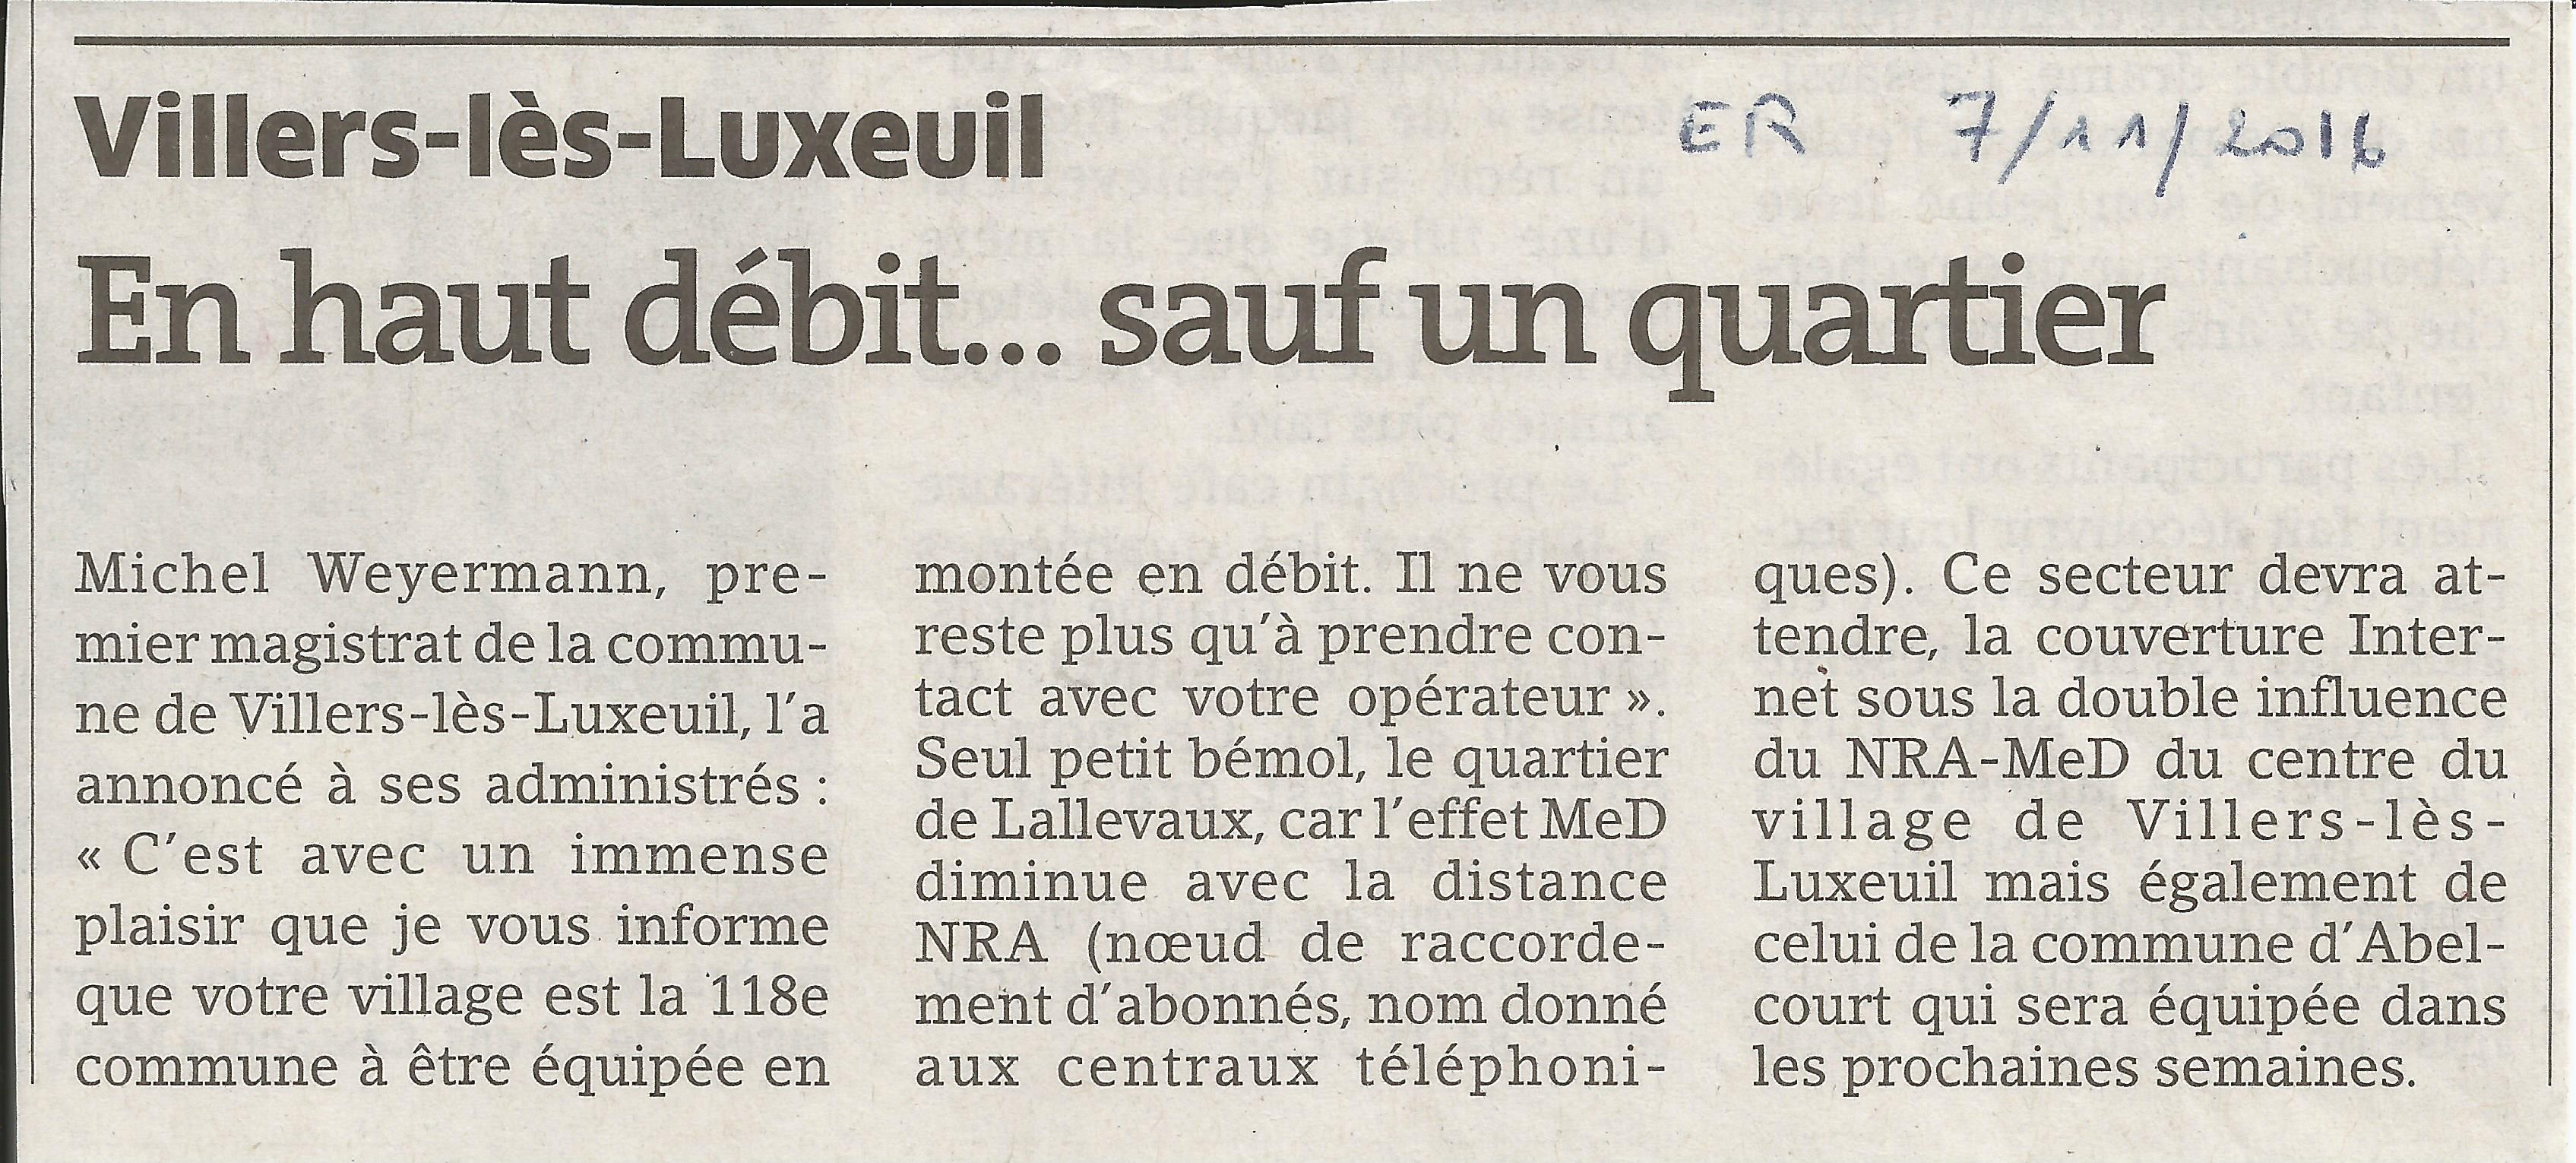 https://www.villers-les-luxeuil.com/projets/villers/files/images/2016_Mairie/Presse/2016_11_07.jpg